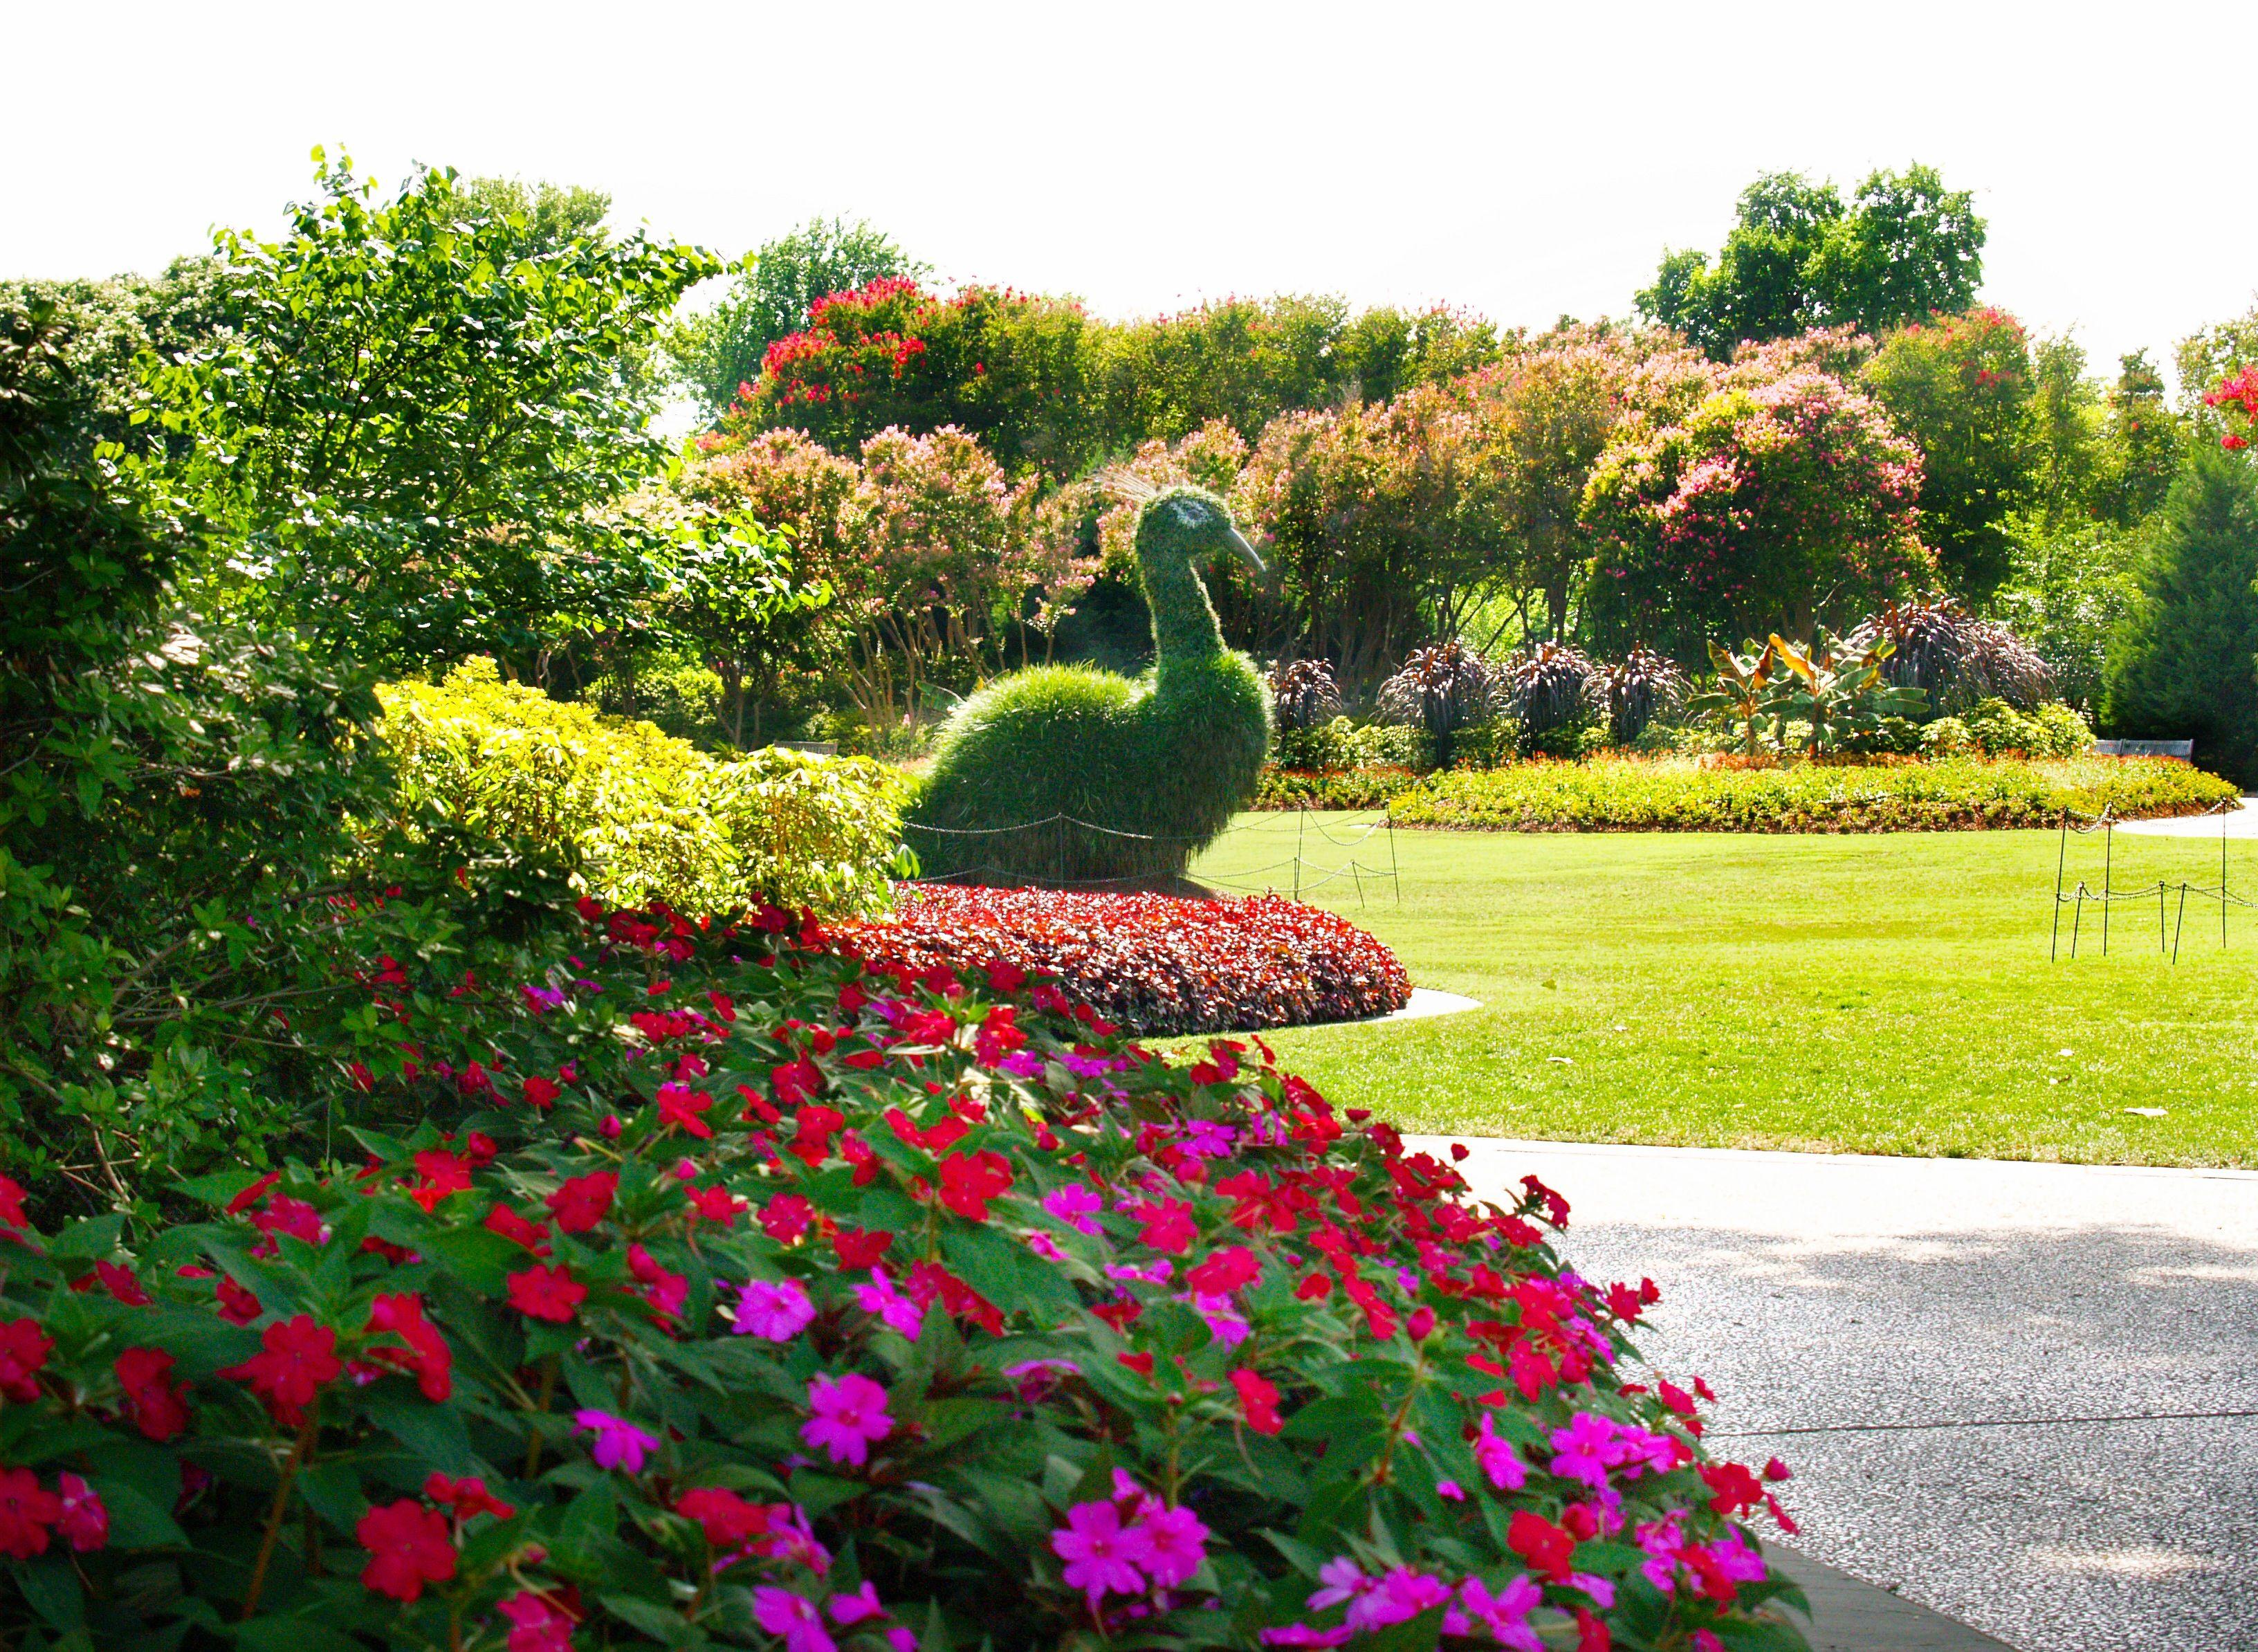 68 best summer in the garden images on pinterest | dallas